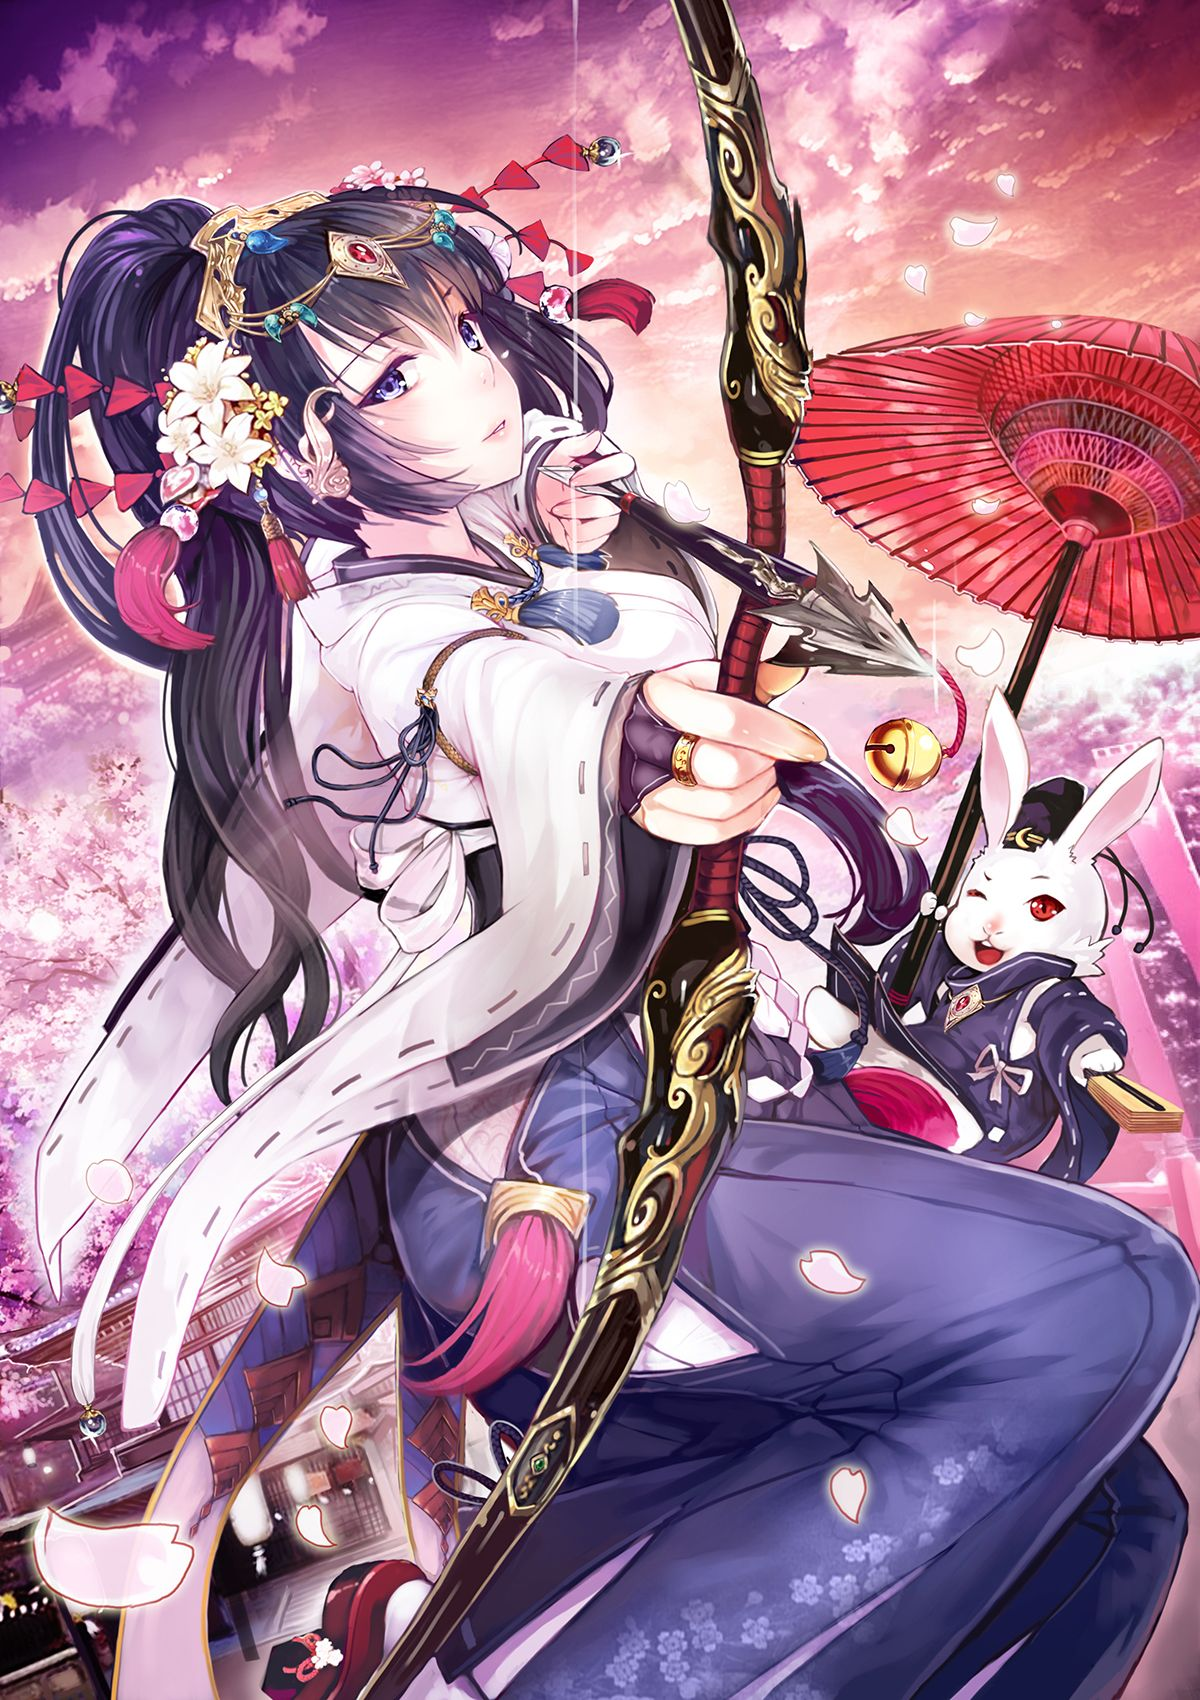 Weapons elliott anime anime art beautiful anime girl - Anime girl with weapon ...